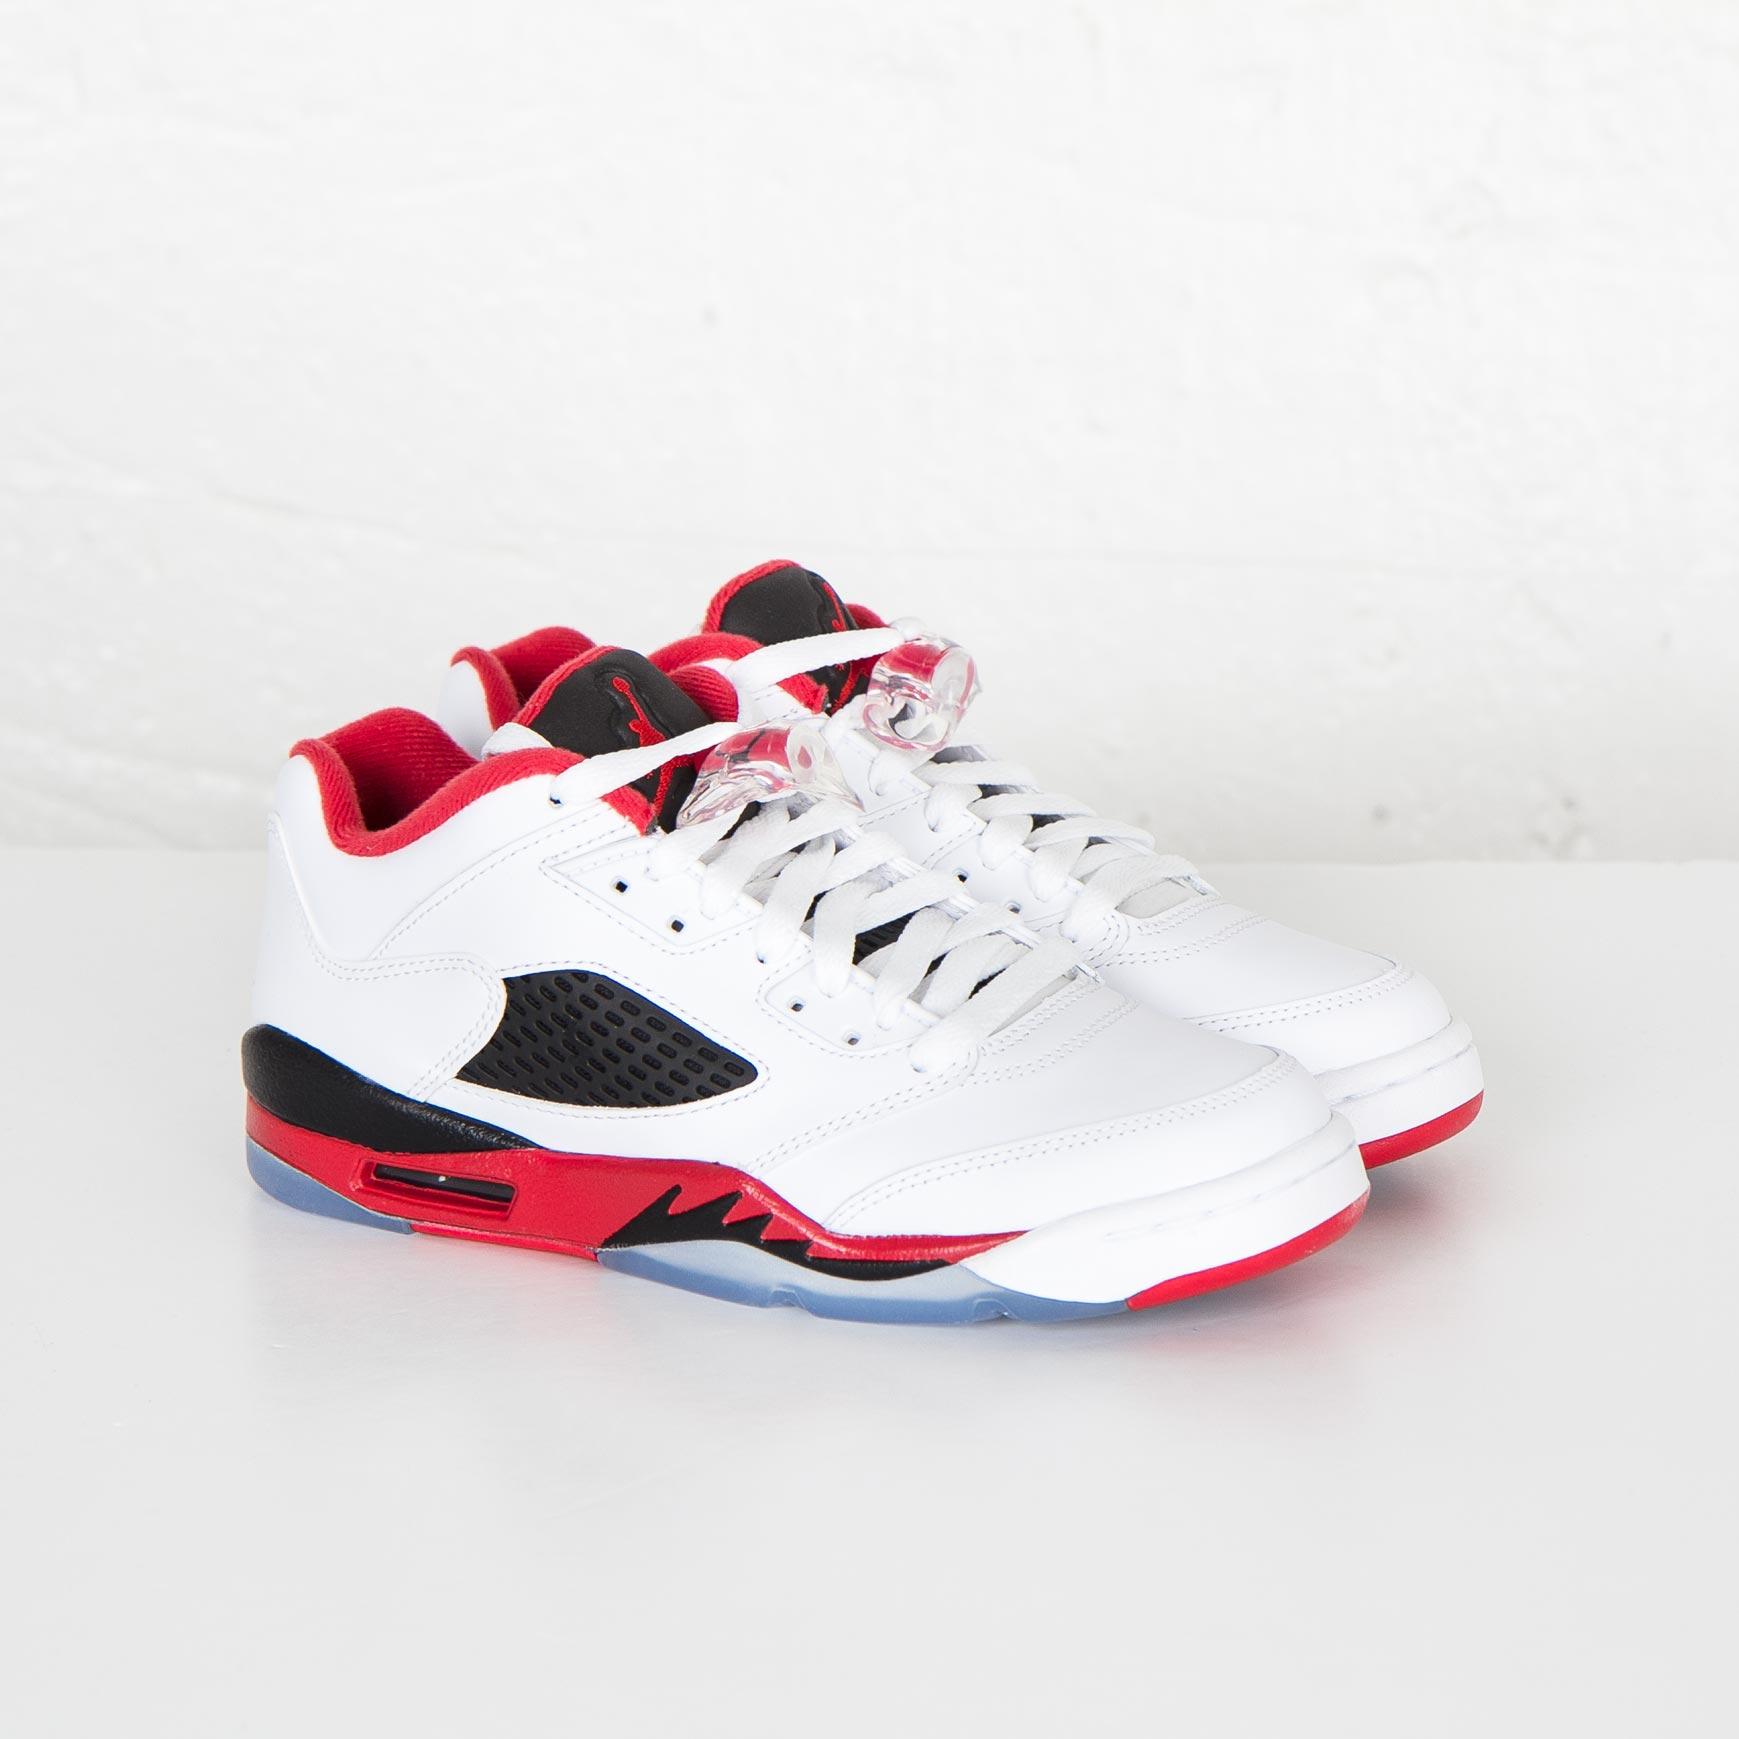 online retailer 5a711 d41d6 Jordan Brand Air Jordan 5 Retro Low (GS)